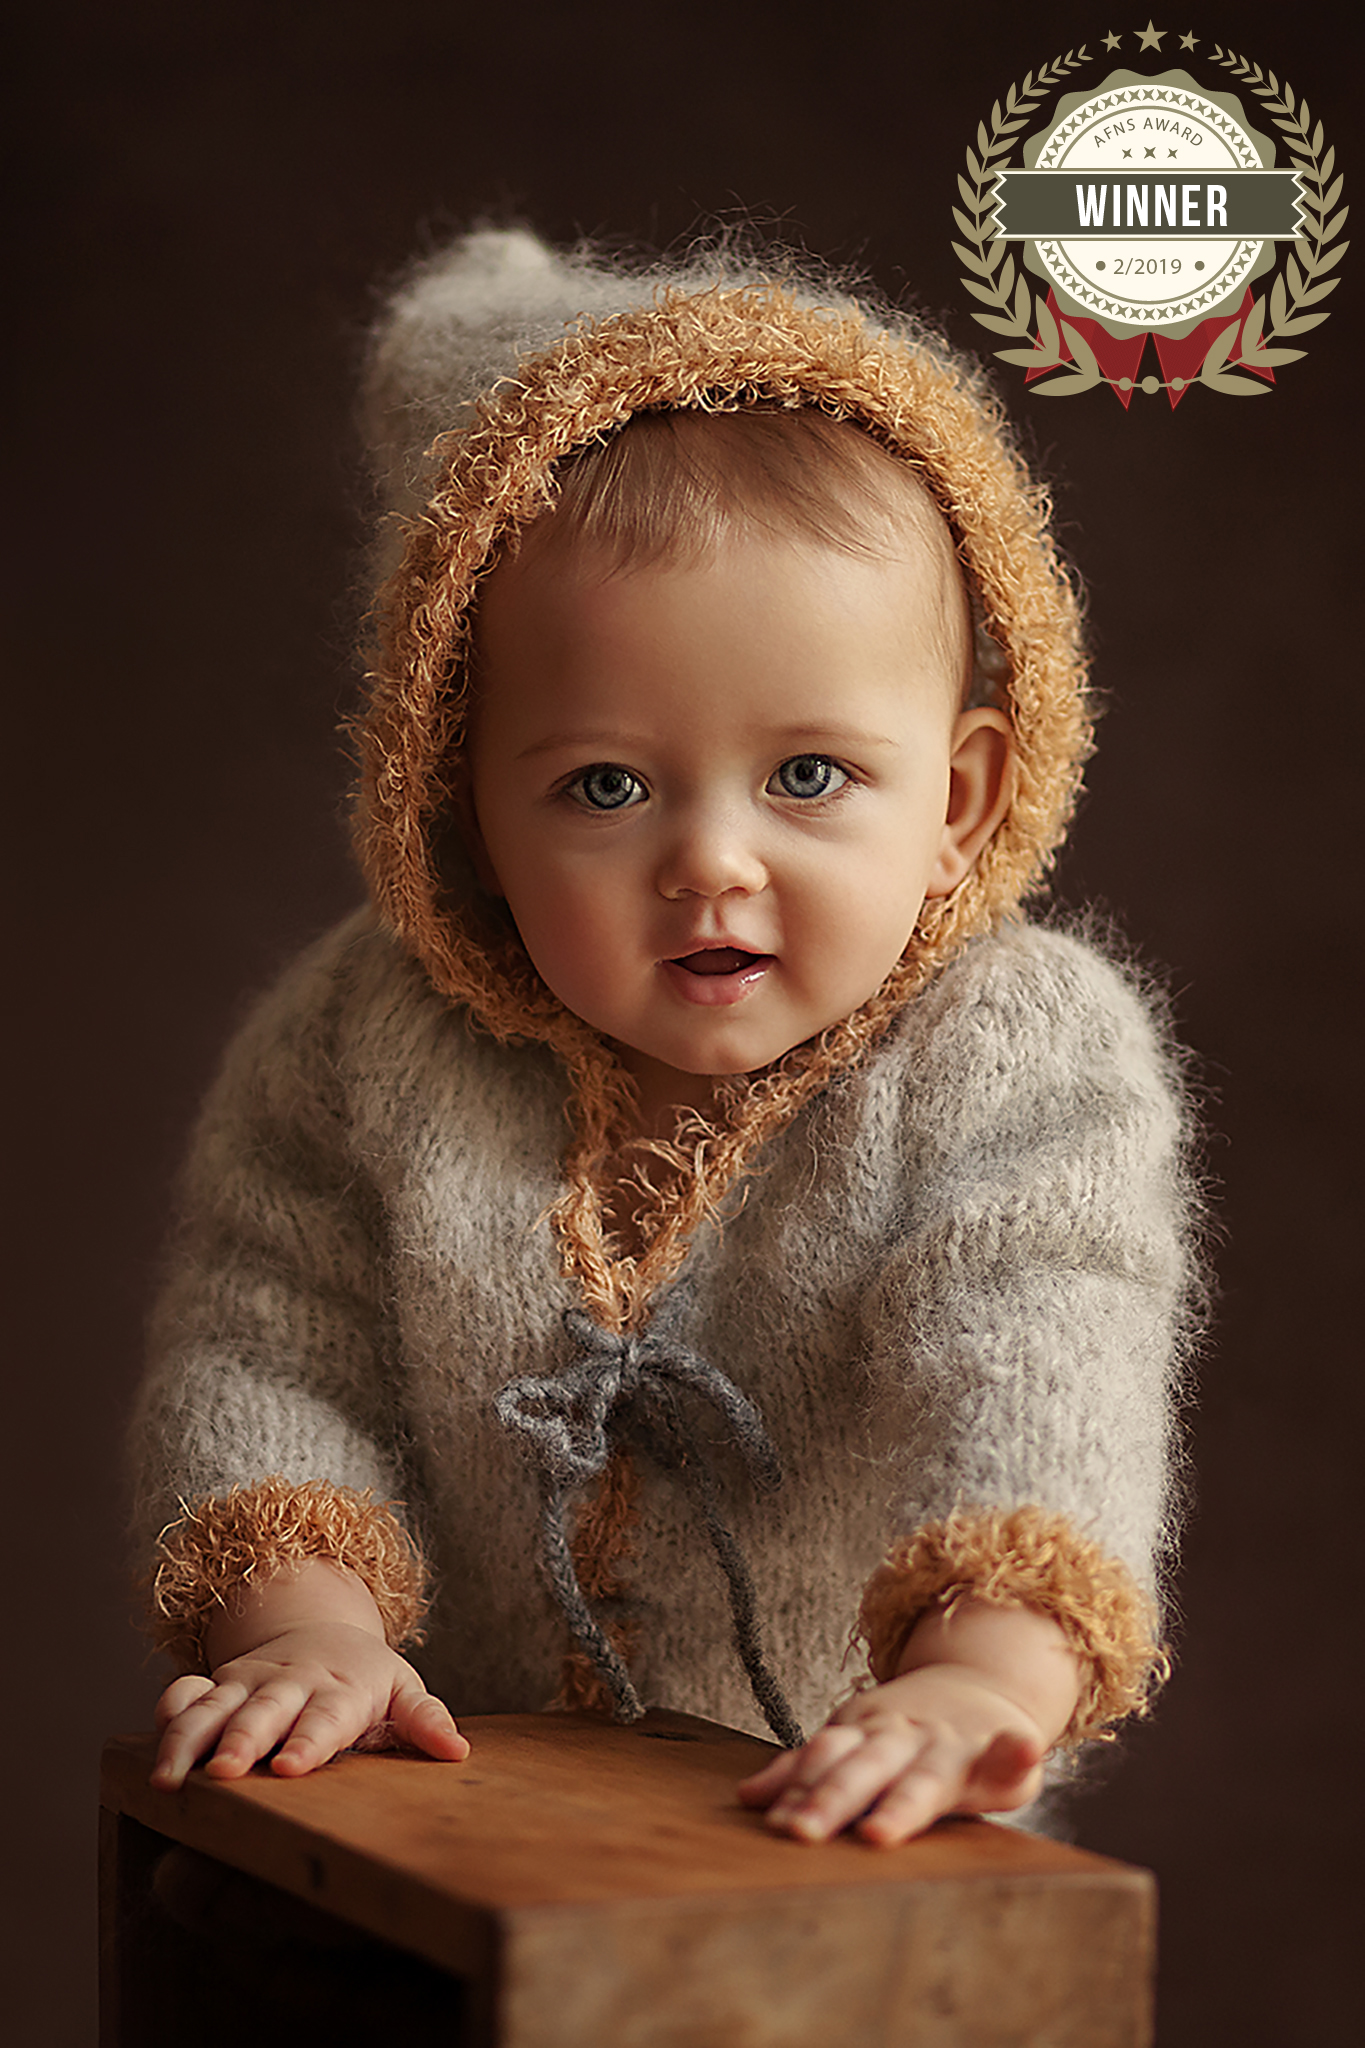 481143201_56906439_AdorableBabyBoy.jpg